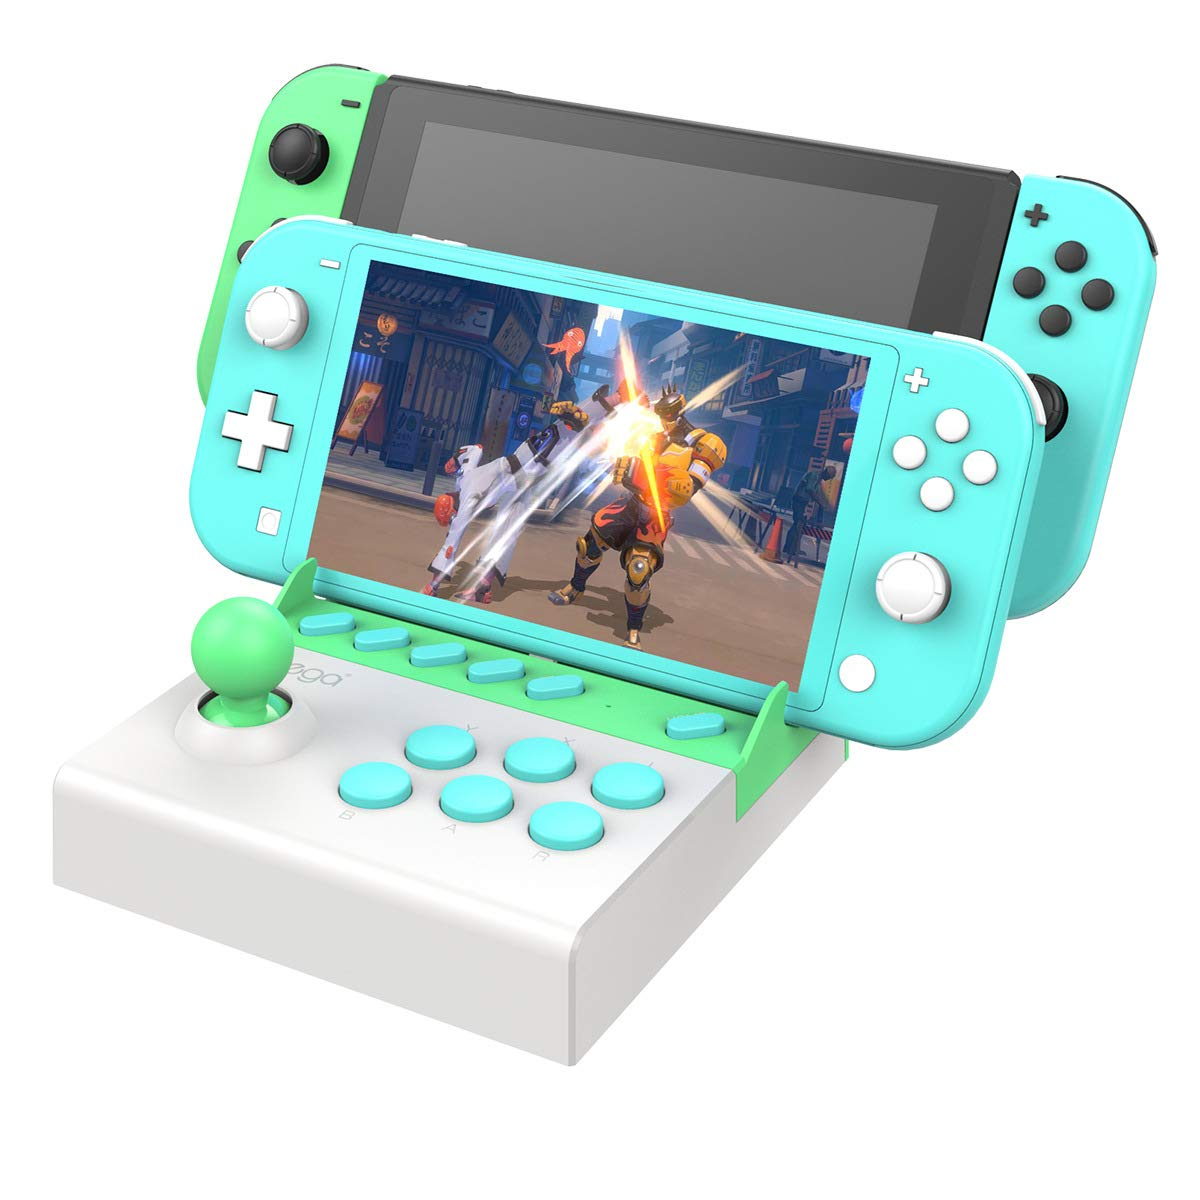 Mini Arcade Stick para Nintendo Switch, Mini Palo de lucha para juegos de Nintendo Switch - Animal Crossing New Horizons Edition: Amazon.es: Electrónica